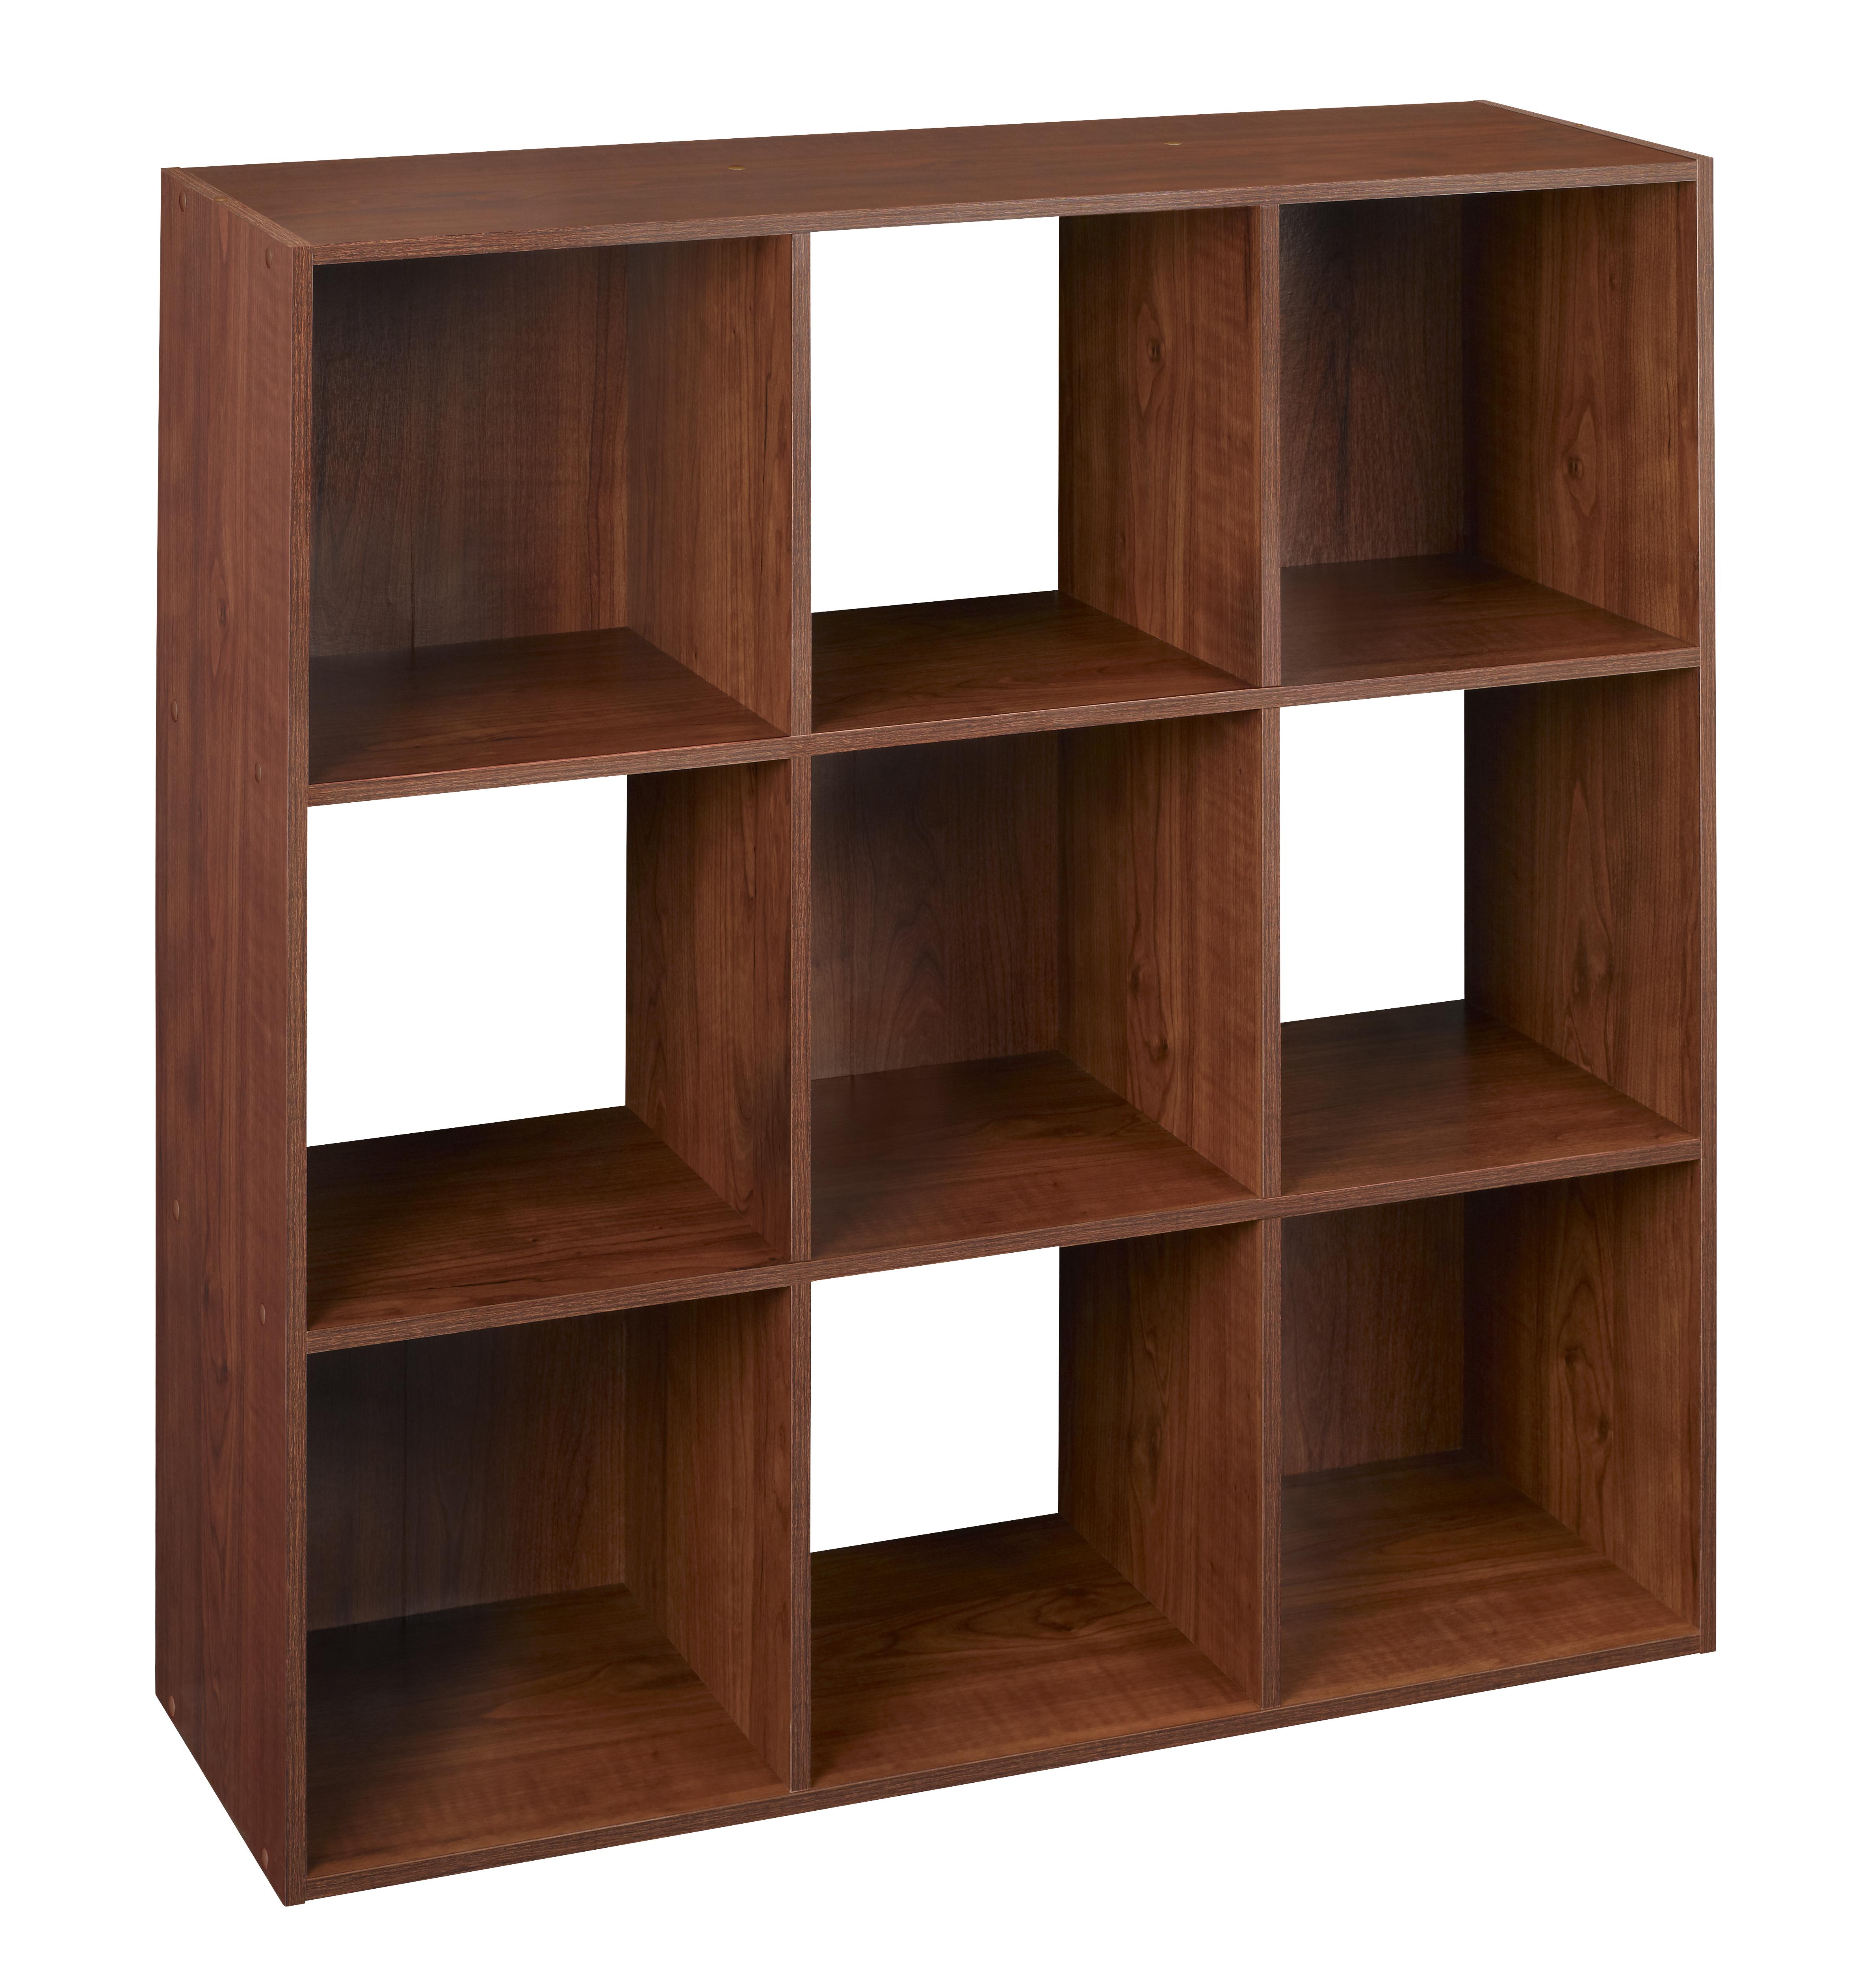 closetmaid cubeicals 9 cube organizer ebay. Black Bedroom Furniture Sets. Home Design Ideas